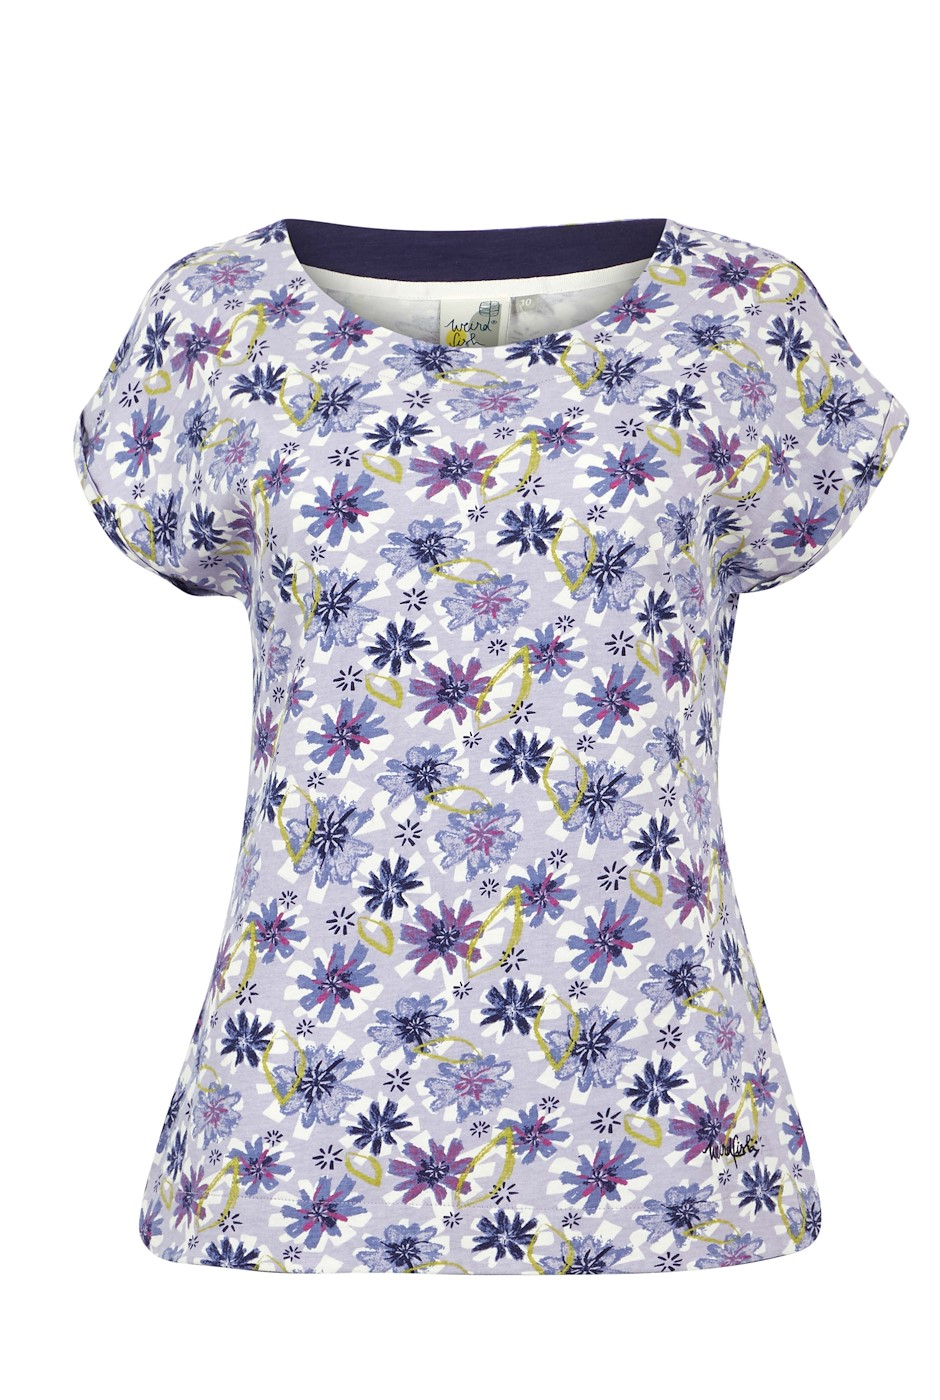 Paw Paw Organic Cotton Printed Jersey T-Shirt Lilac Hint